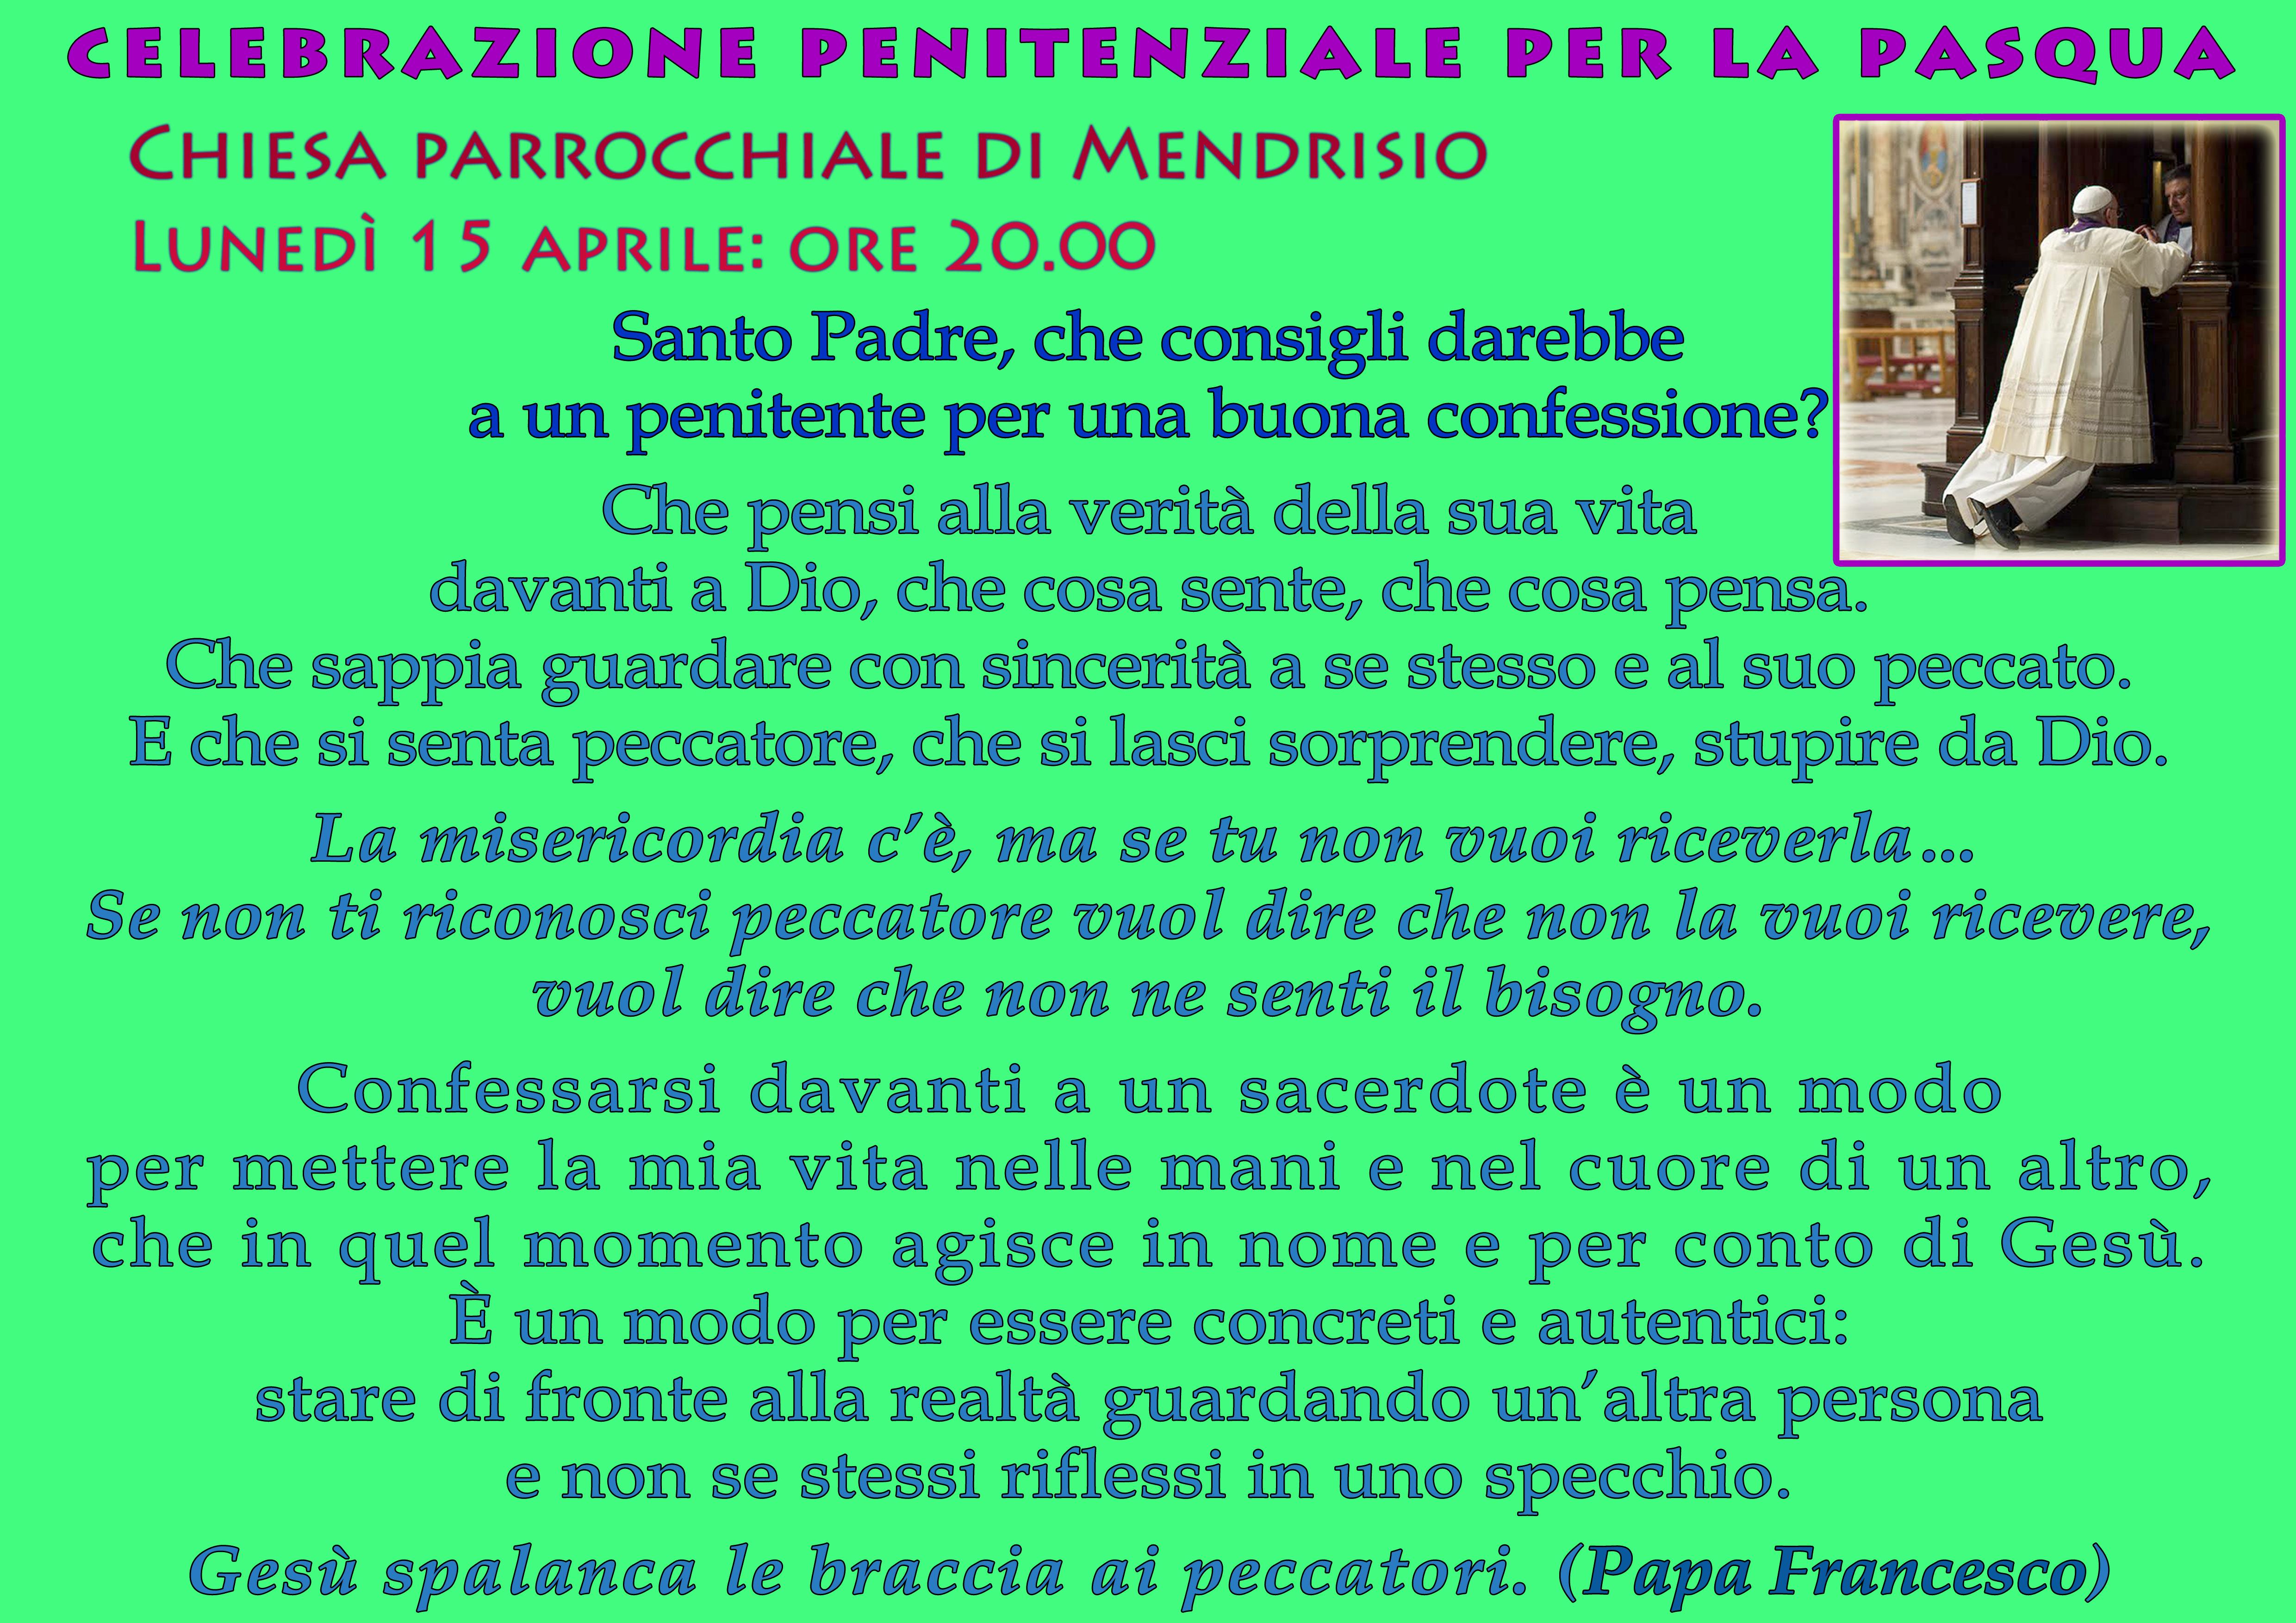 2019_Celebrazione Penitenziale_Pasqua_fin